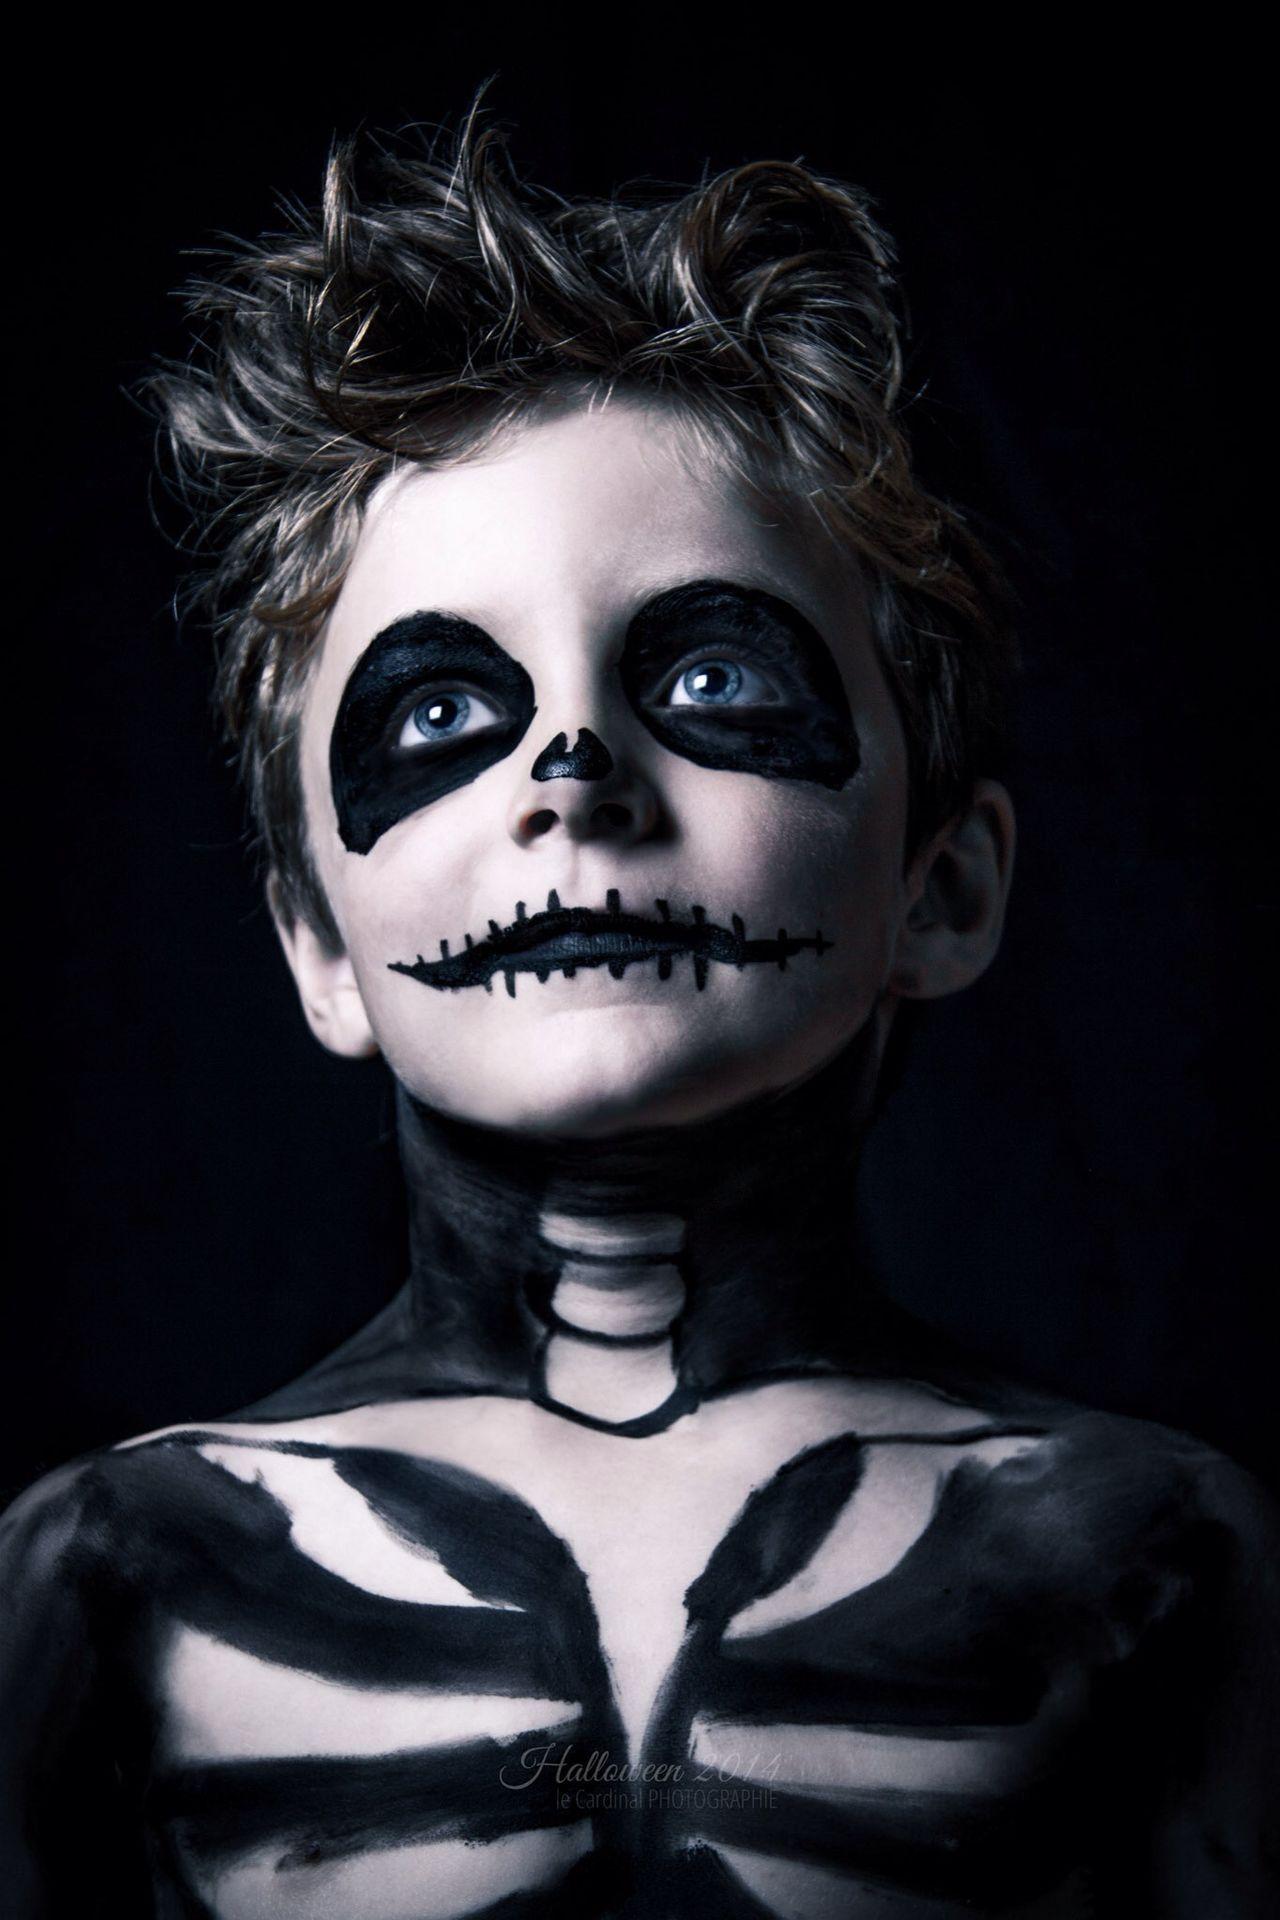 Halloween Horrors 6 years old Skeleton ready for Halloween Davidlecardinal